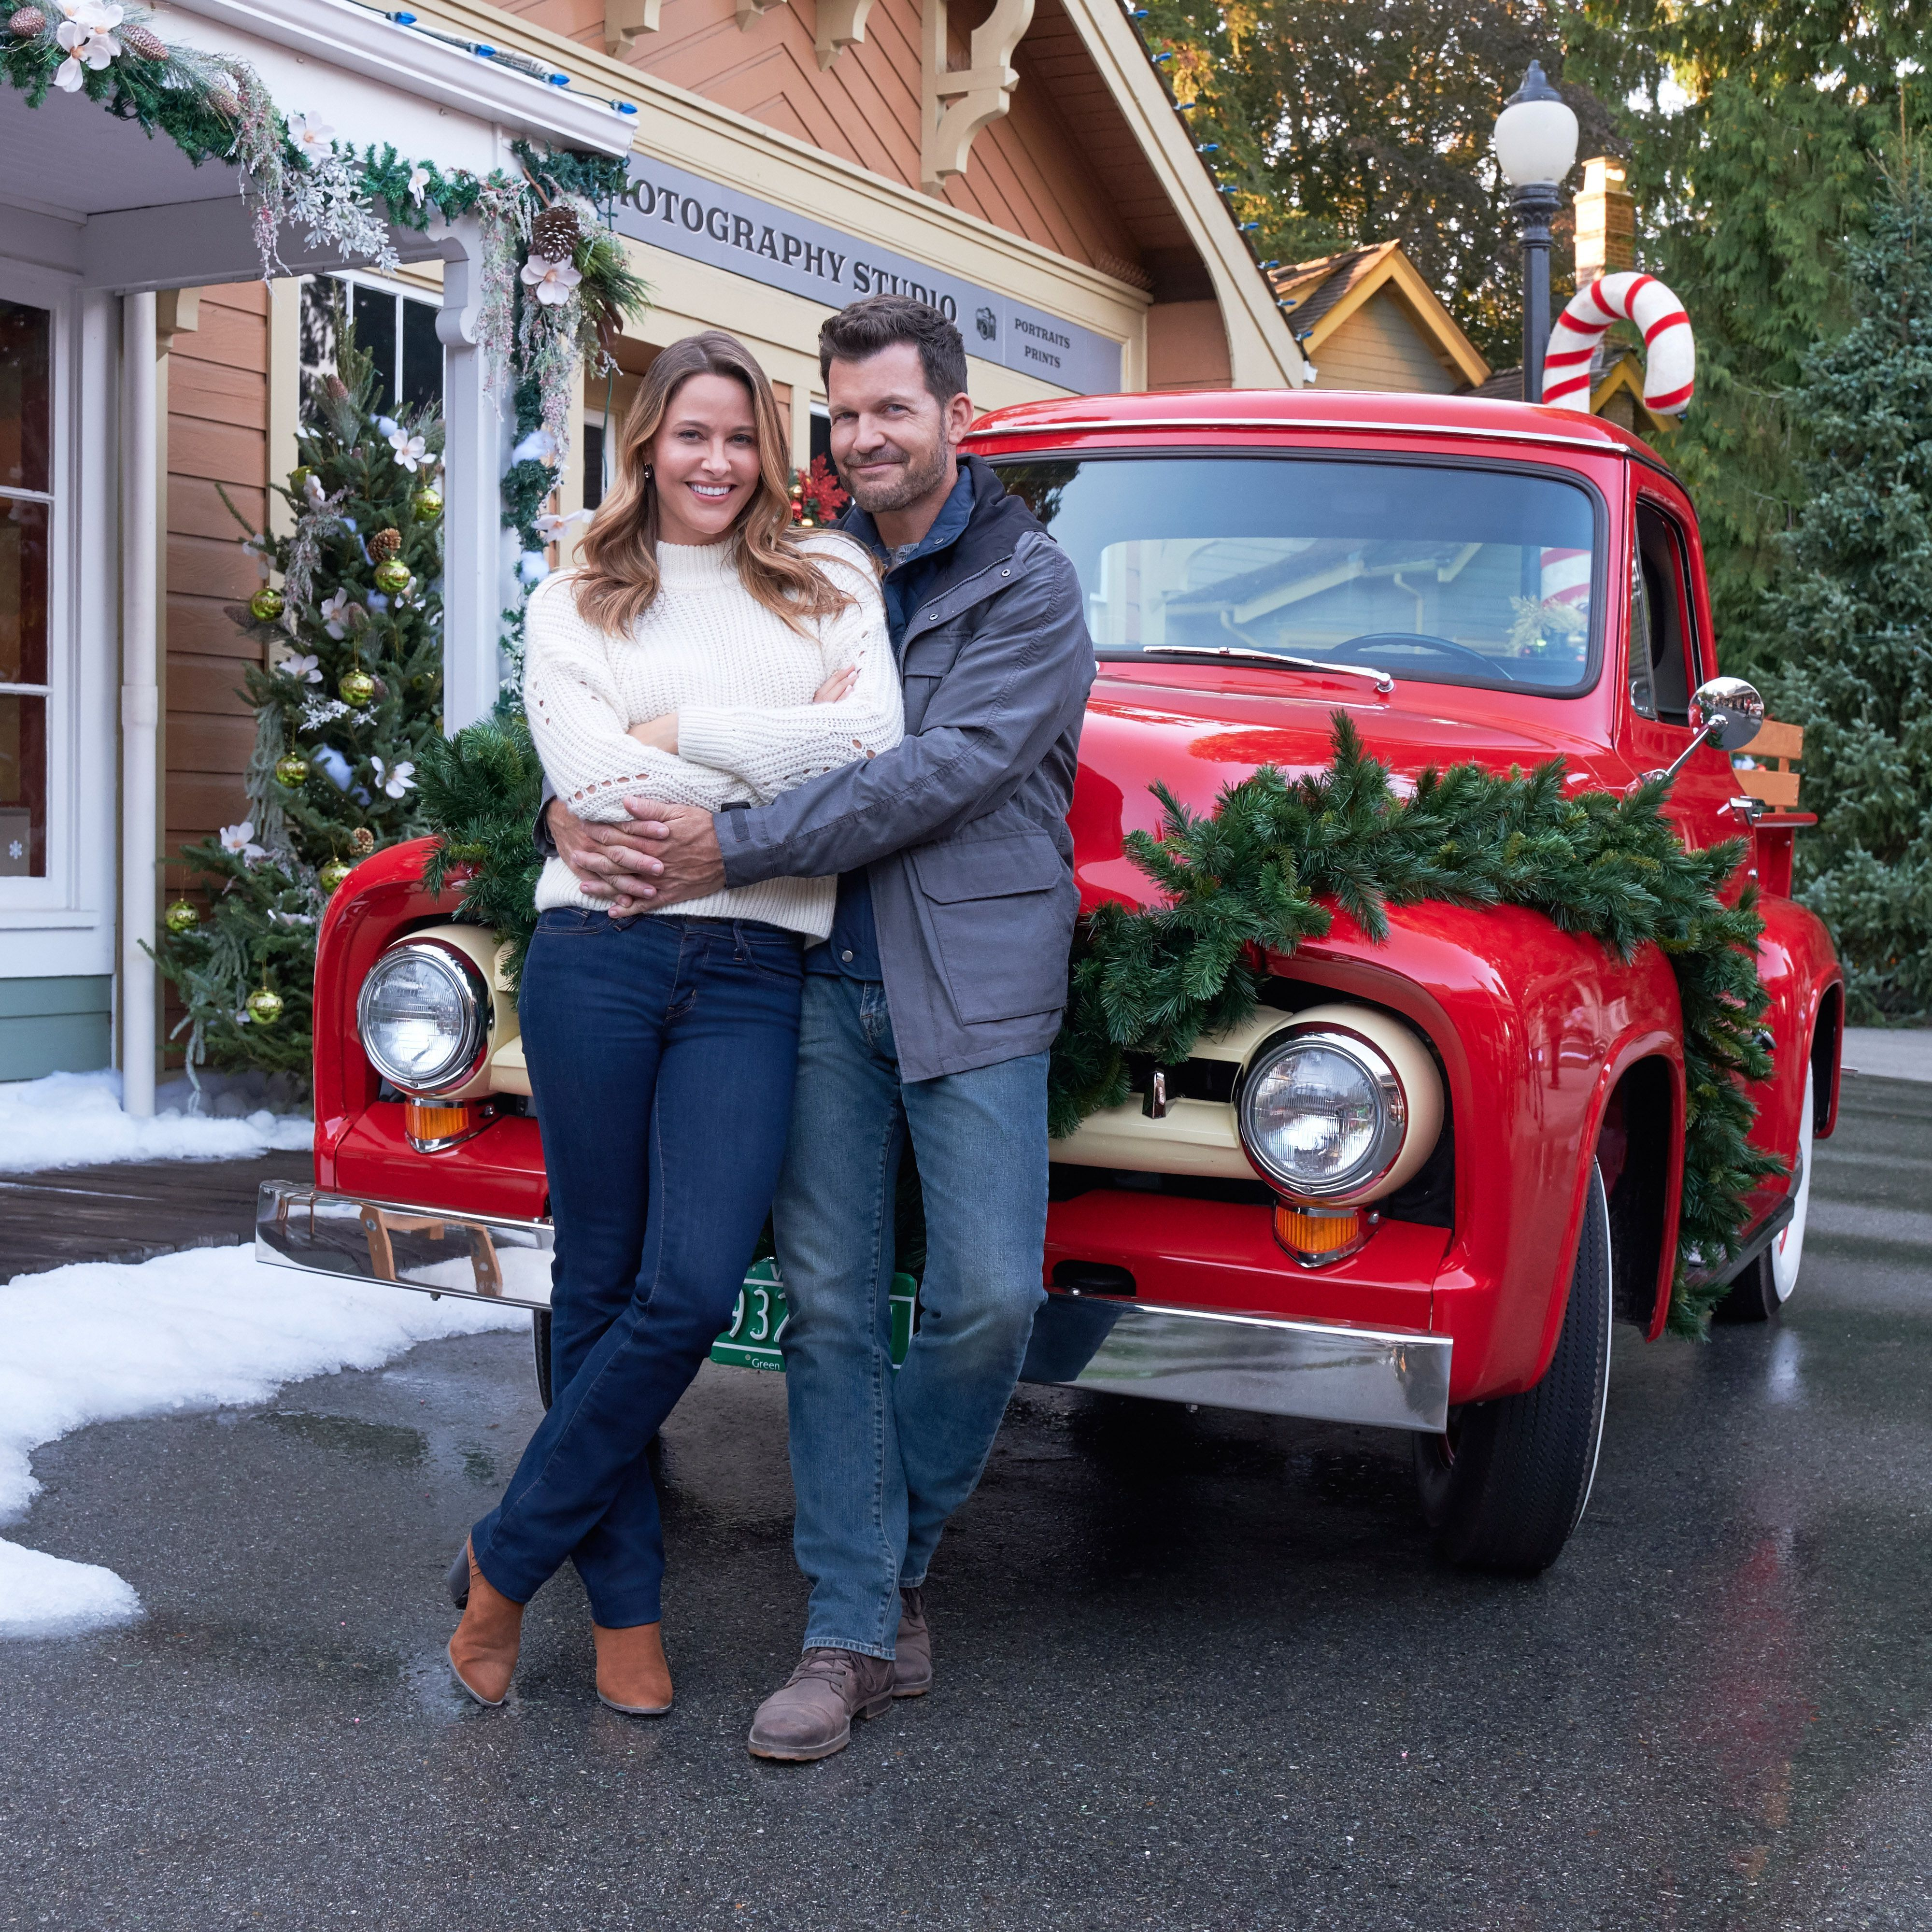 This Hallmark Christmas Movie Set Is a Historic Village